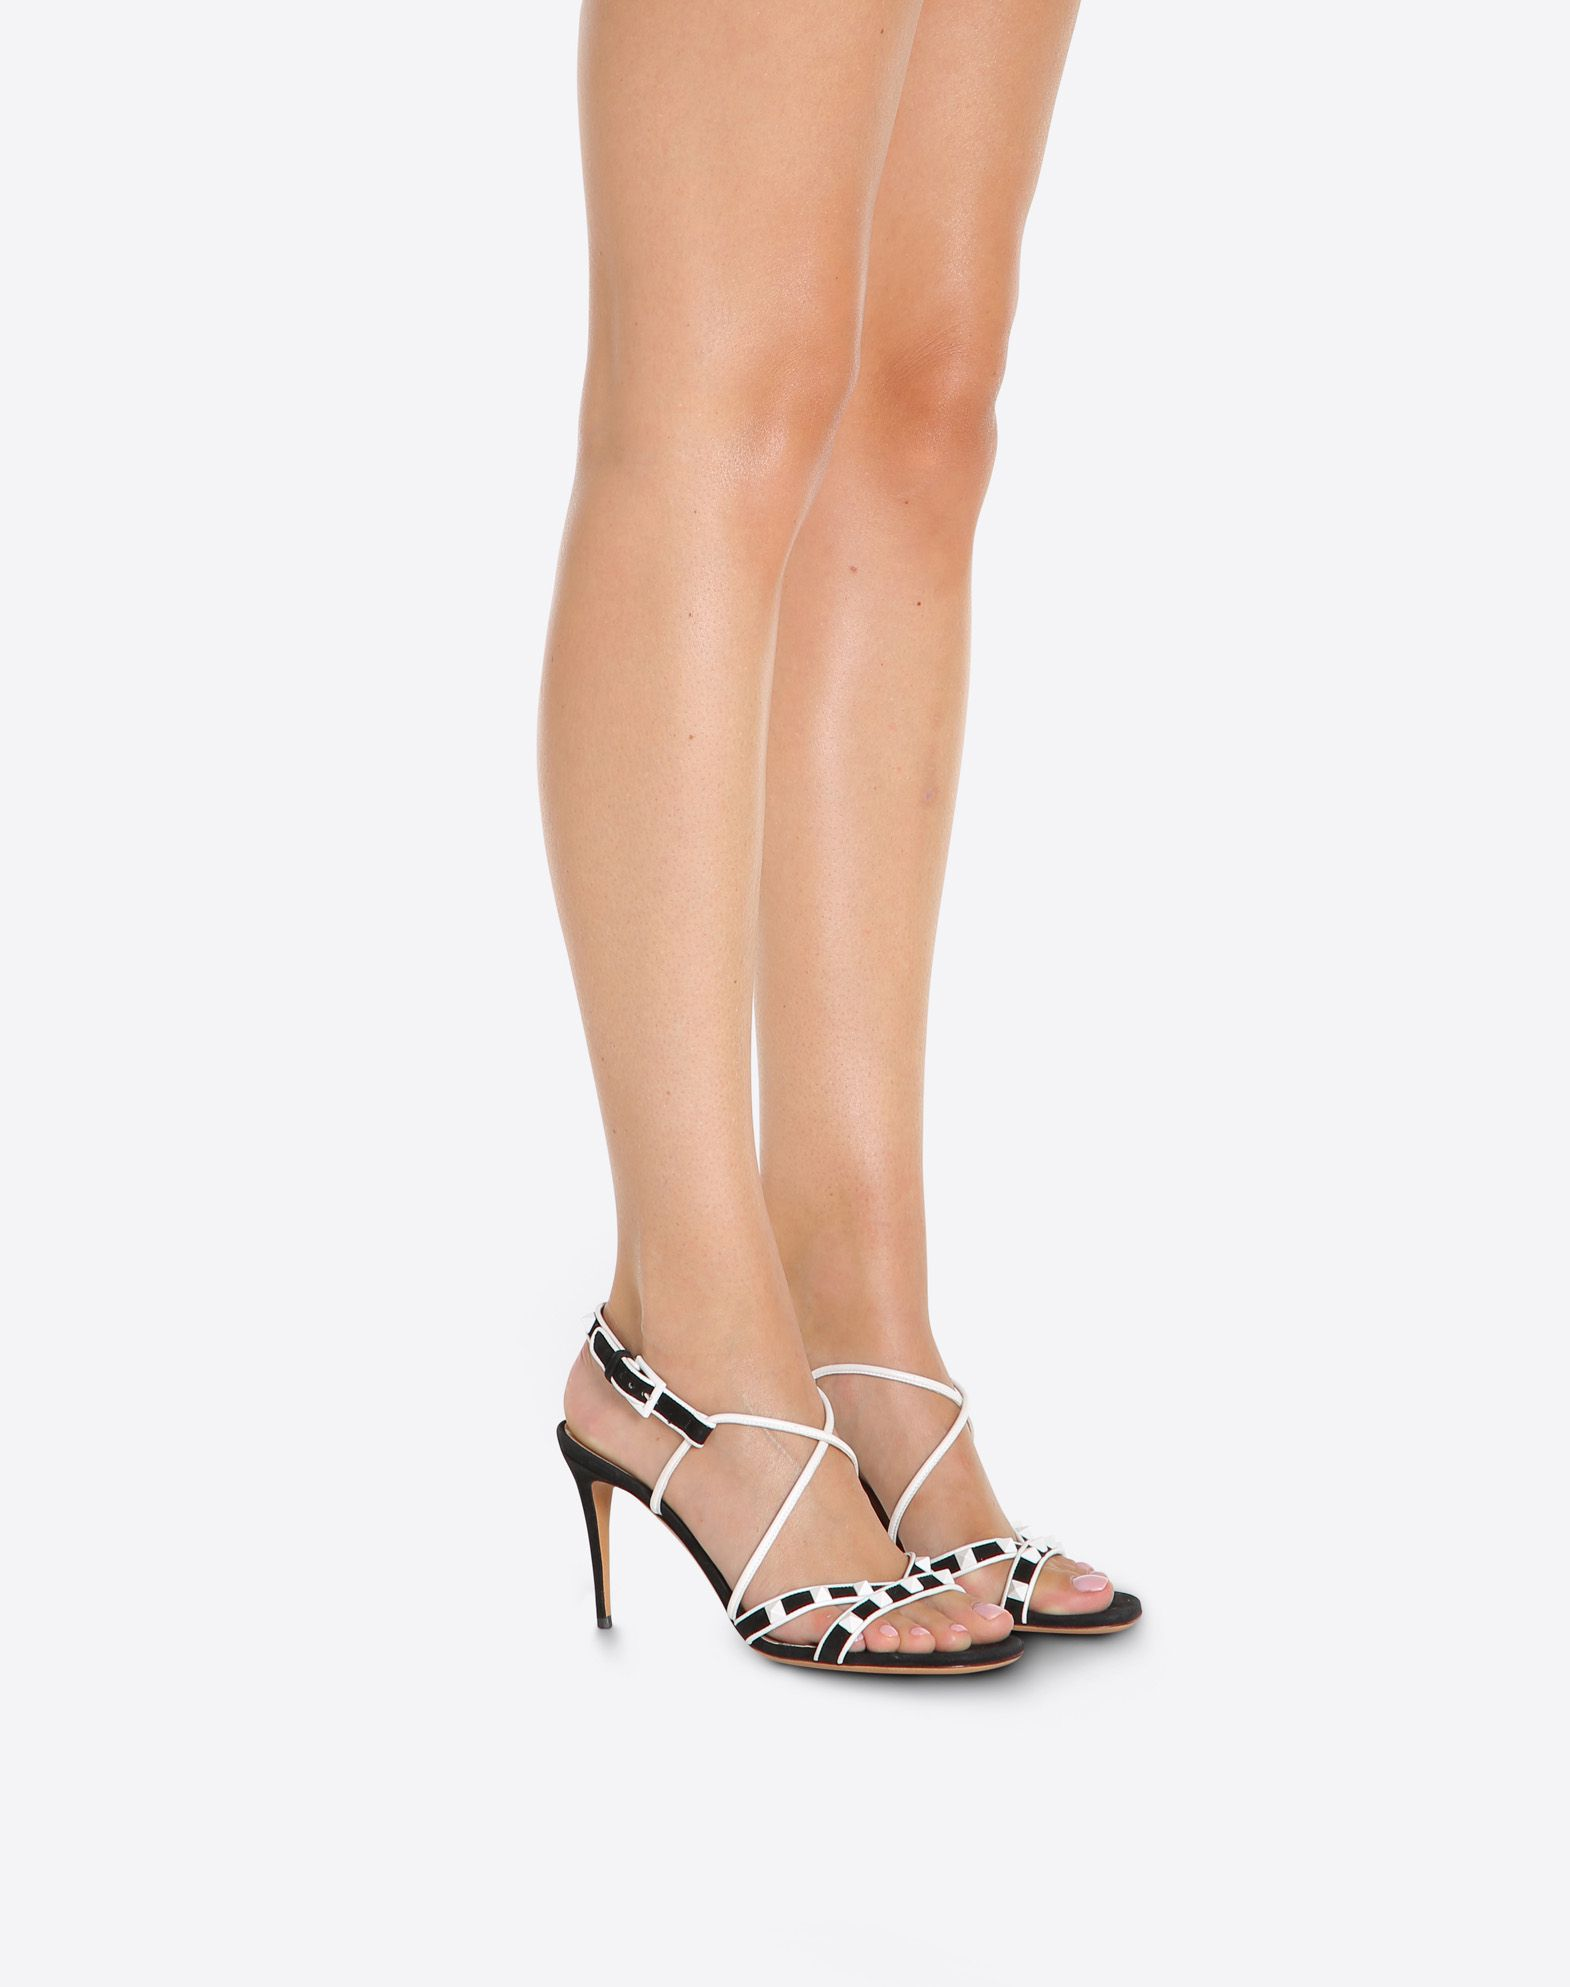 VALENTINO GARAVANI Free Rockstud 85mm Sandal HIGH HEEL SANDALS D a